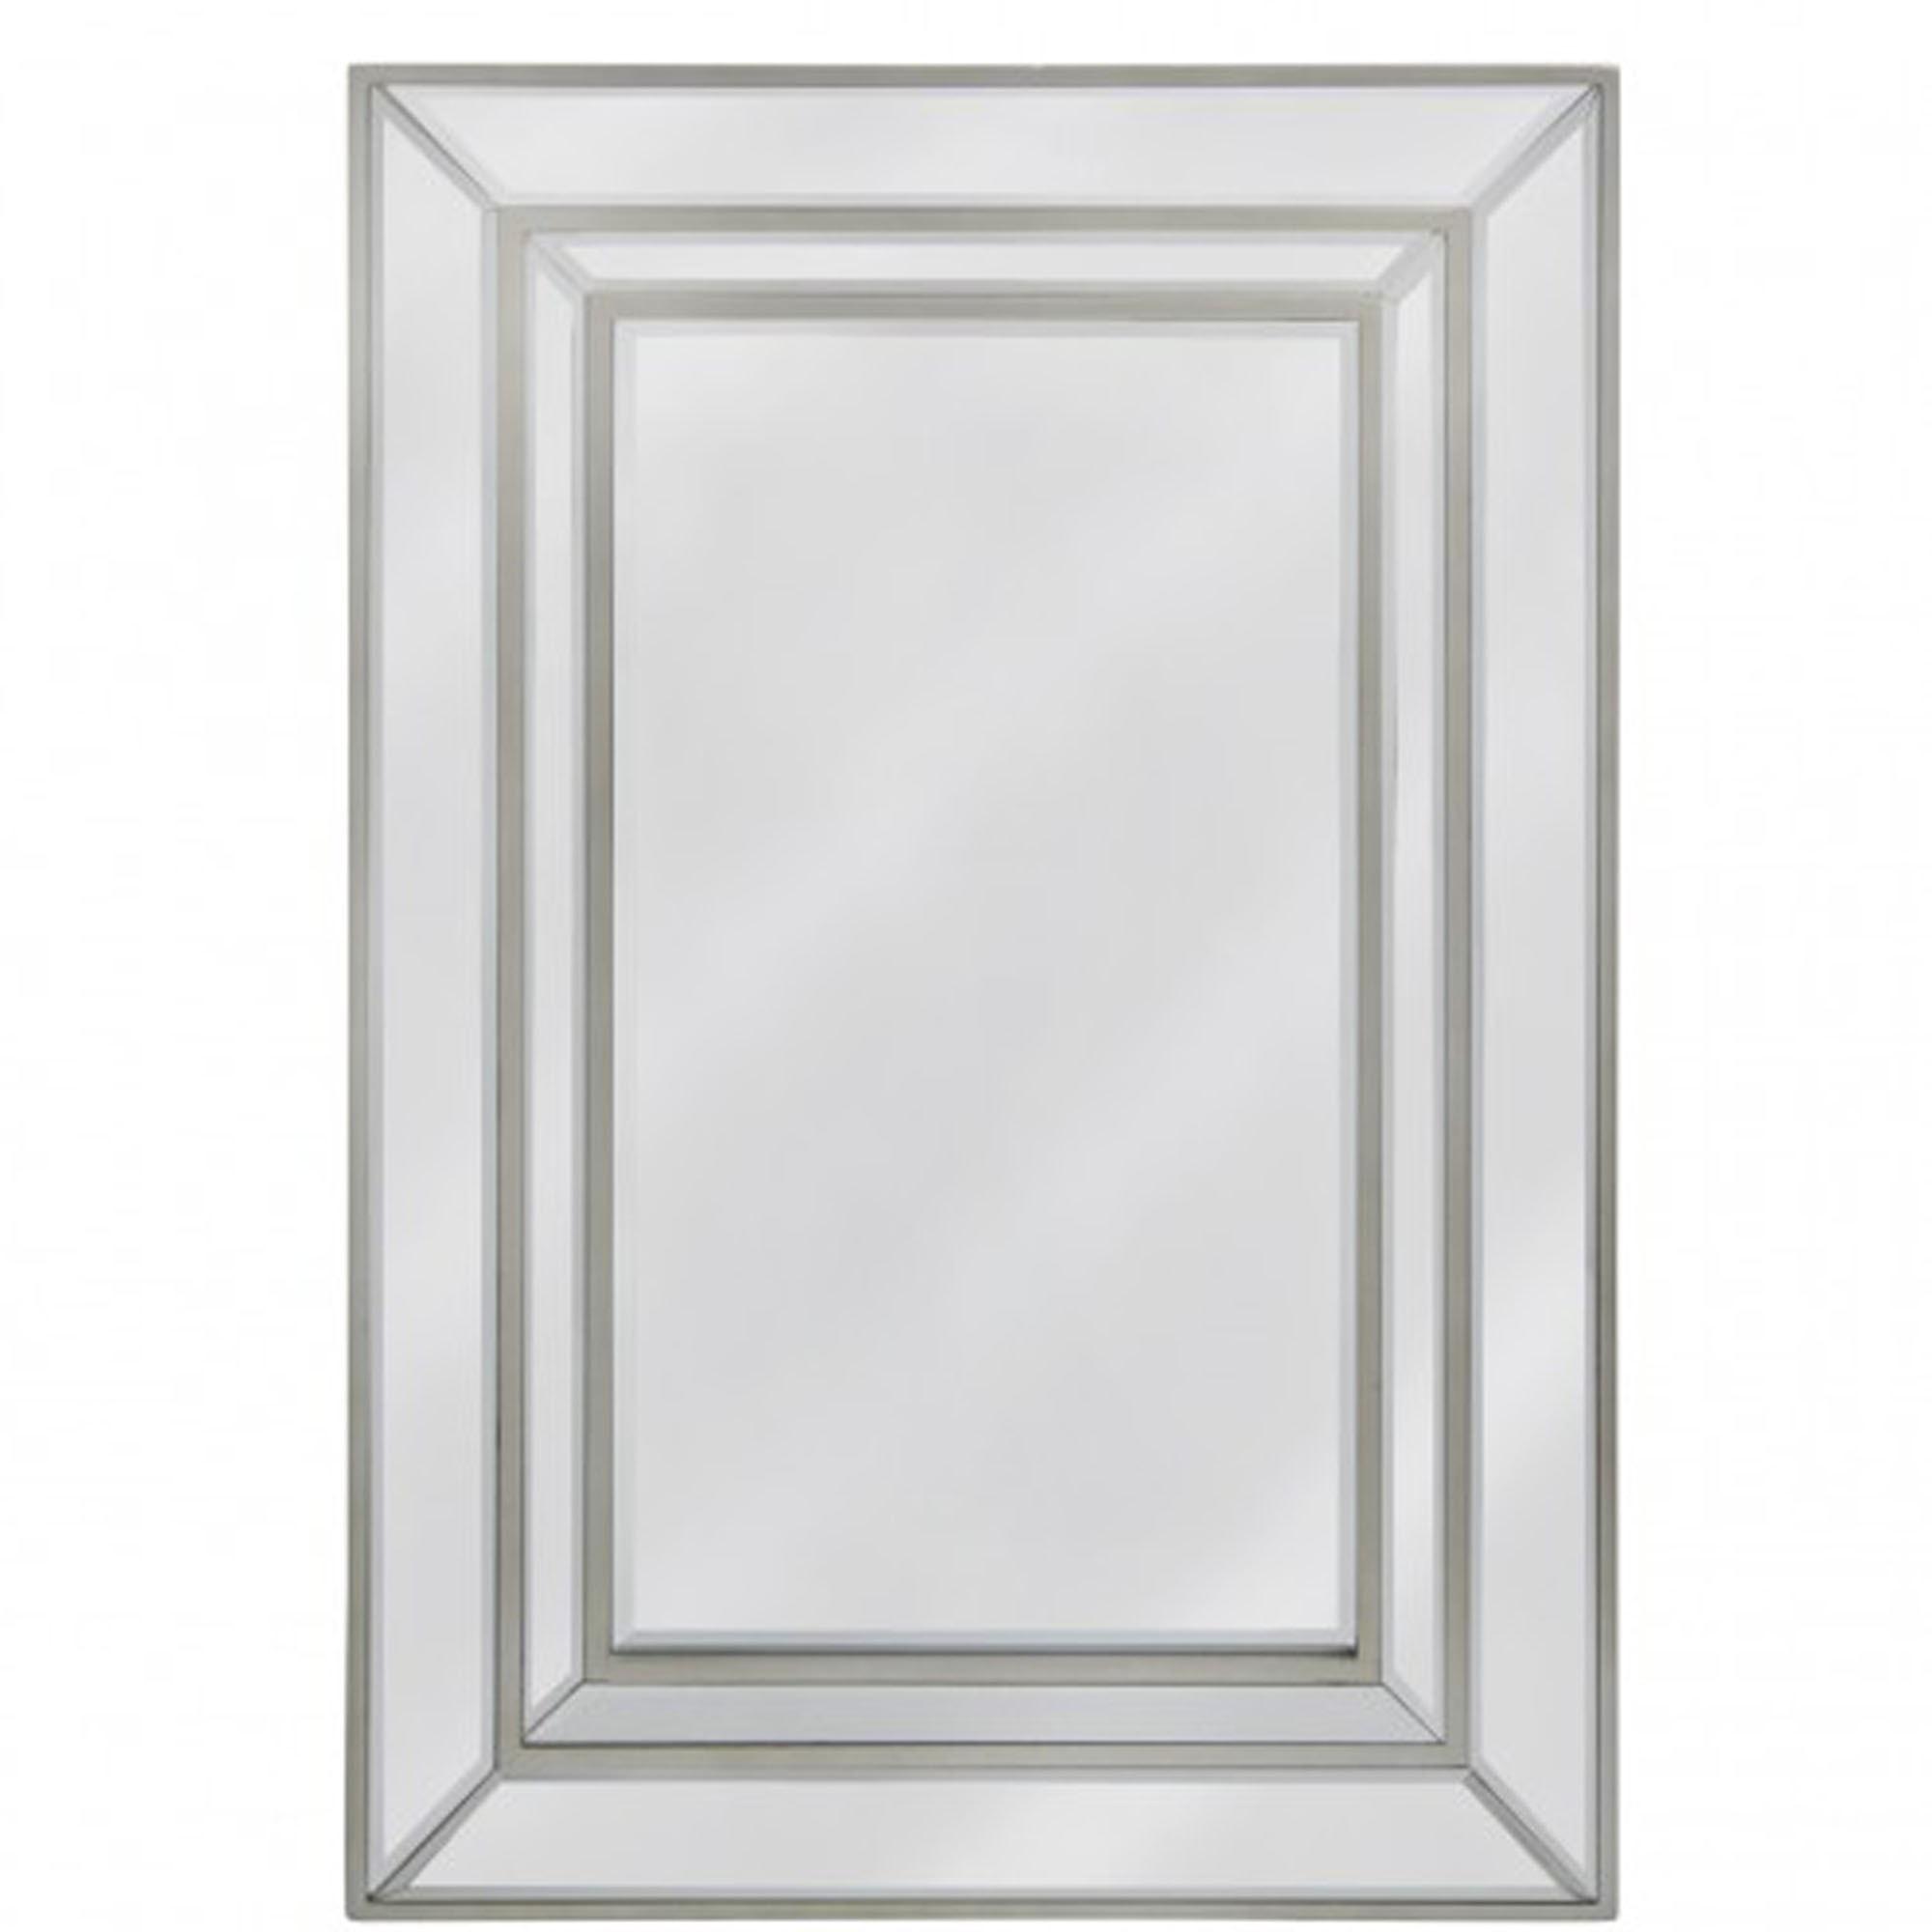 Venatian Style Wall Mirror Mirrored Furniture Wall Mirrors